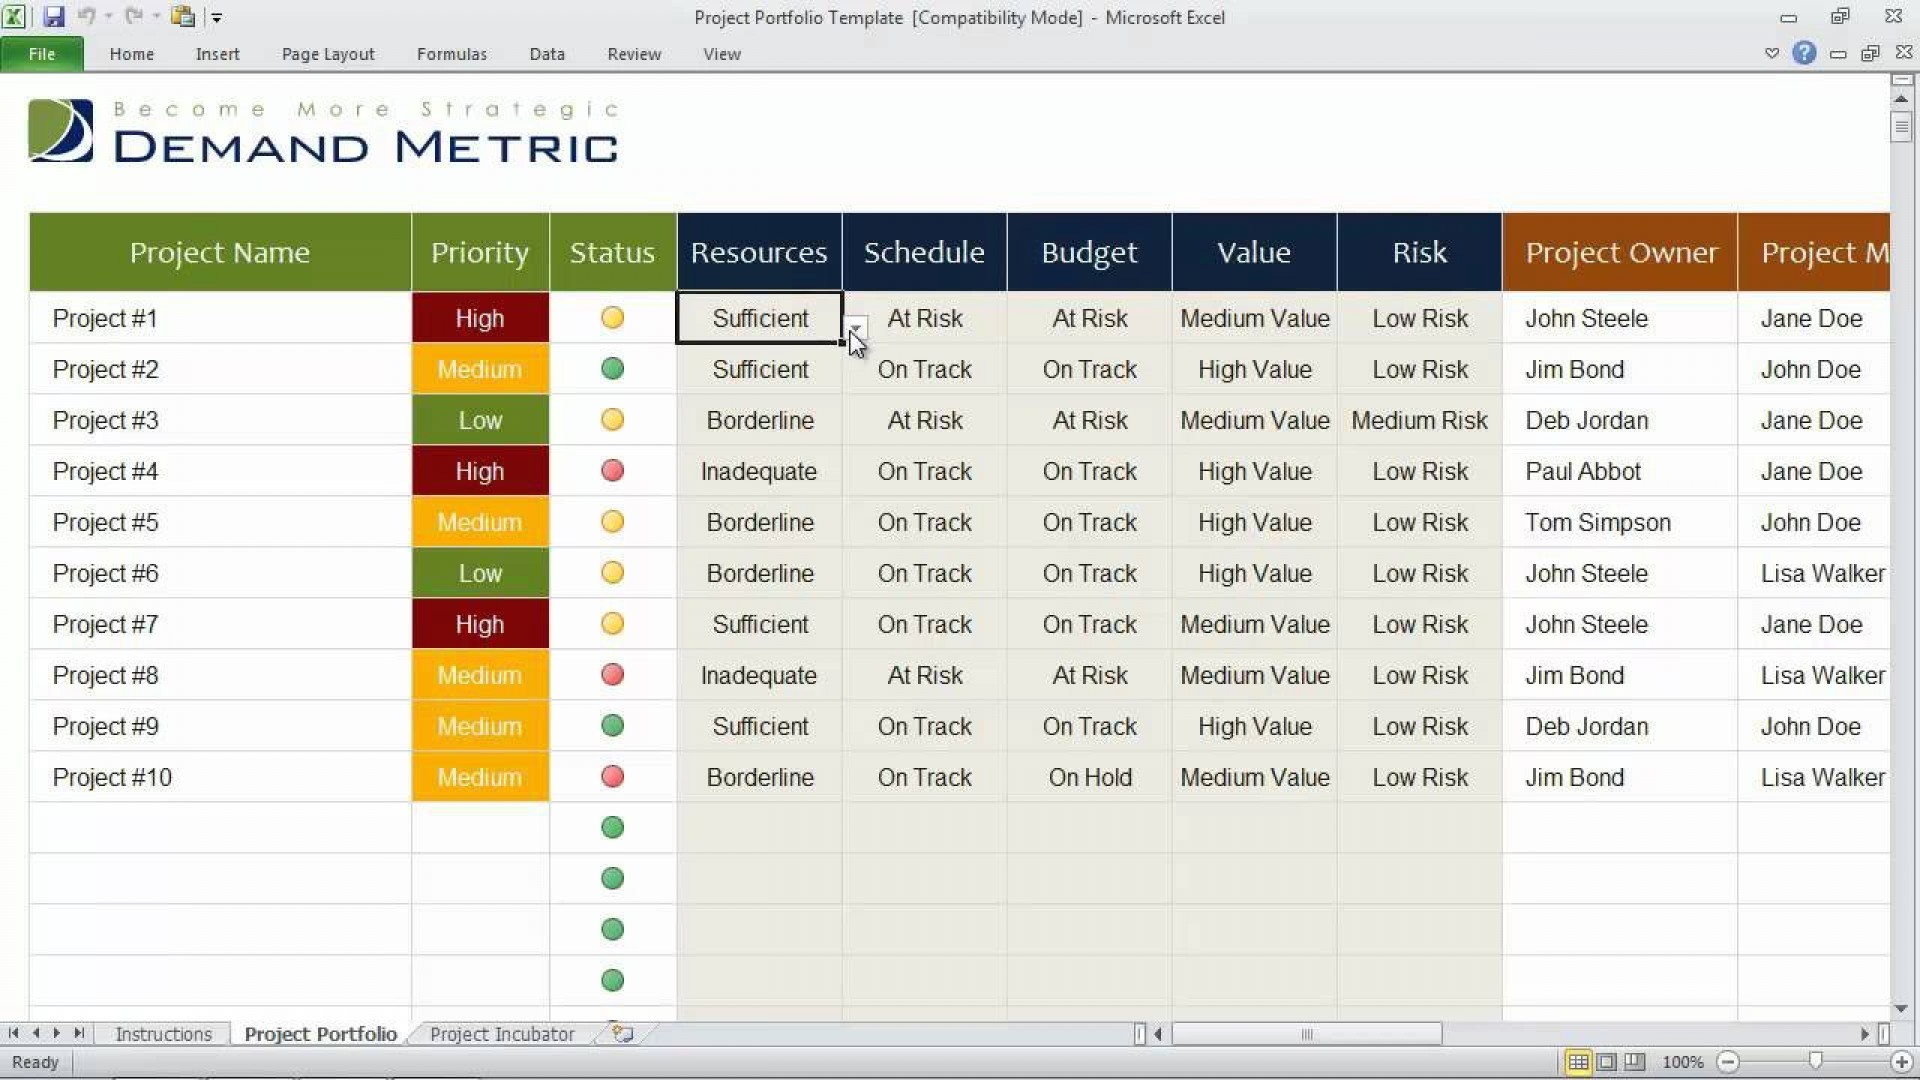 000 Stupendou Project Management Template Free Excel High Definition  Portfolio Construction Tracking1920